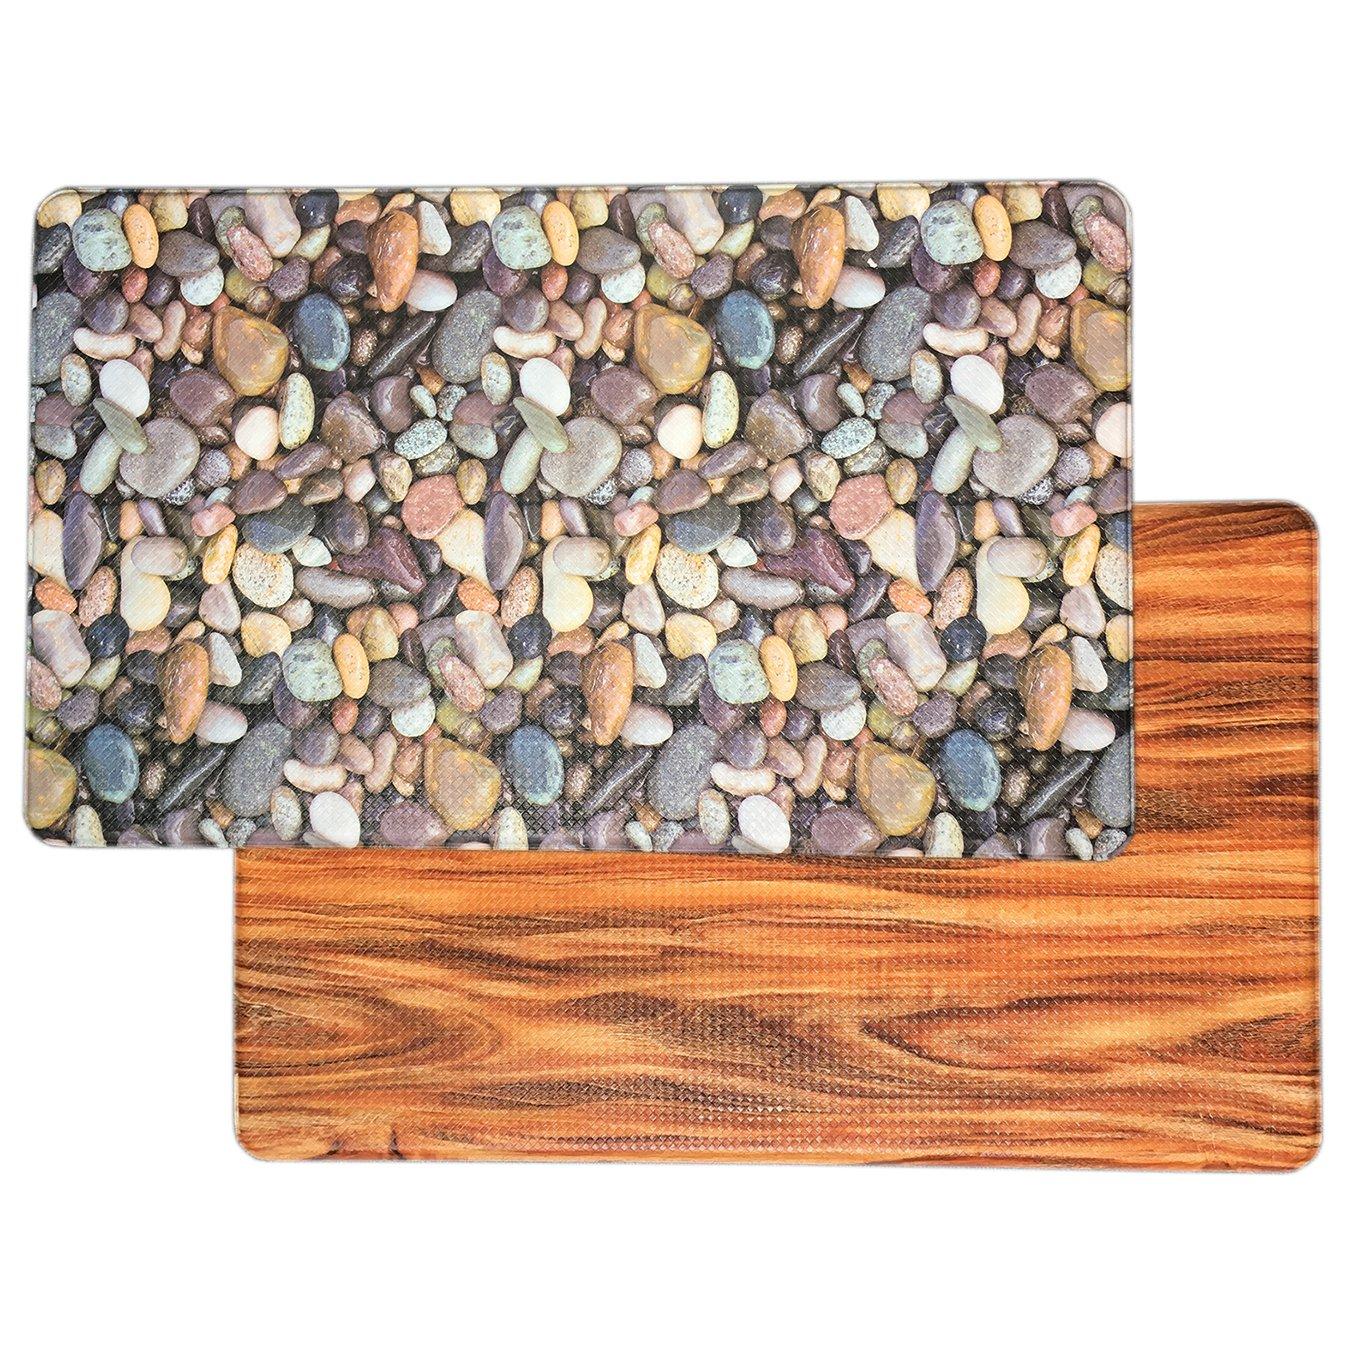 Art3d Premium Reversible Anti Fatigue Kitchen Mat Non-slip Kitchen Rug Standing Floor Mat, 18'' x 30'' Stone-wood